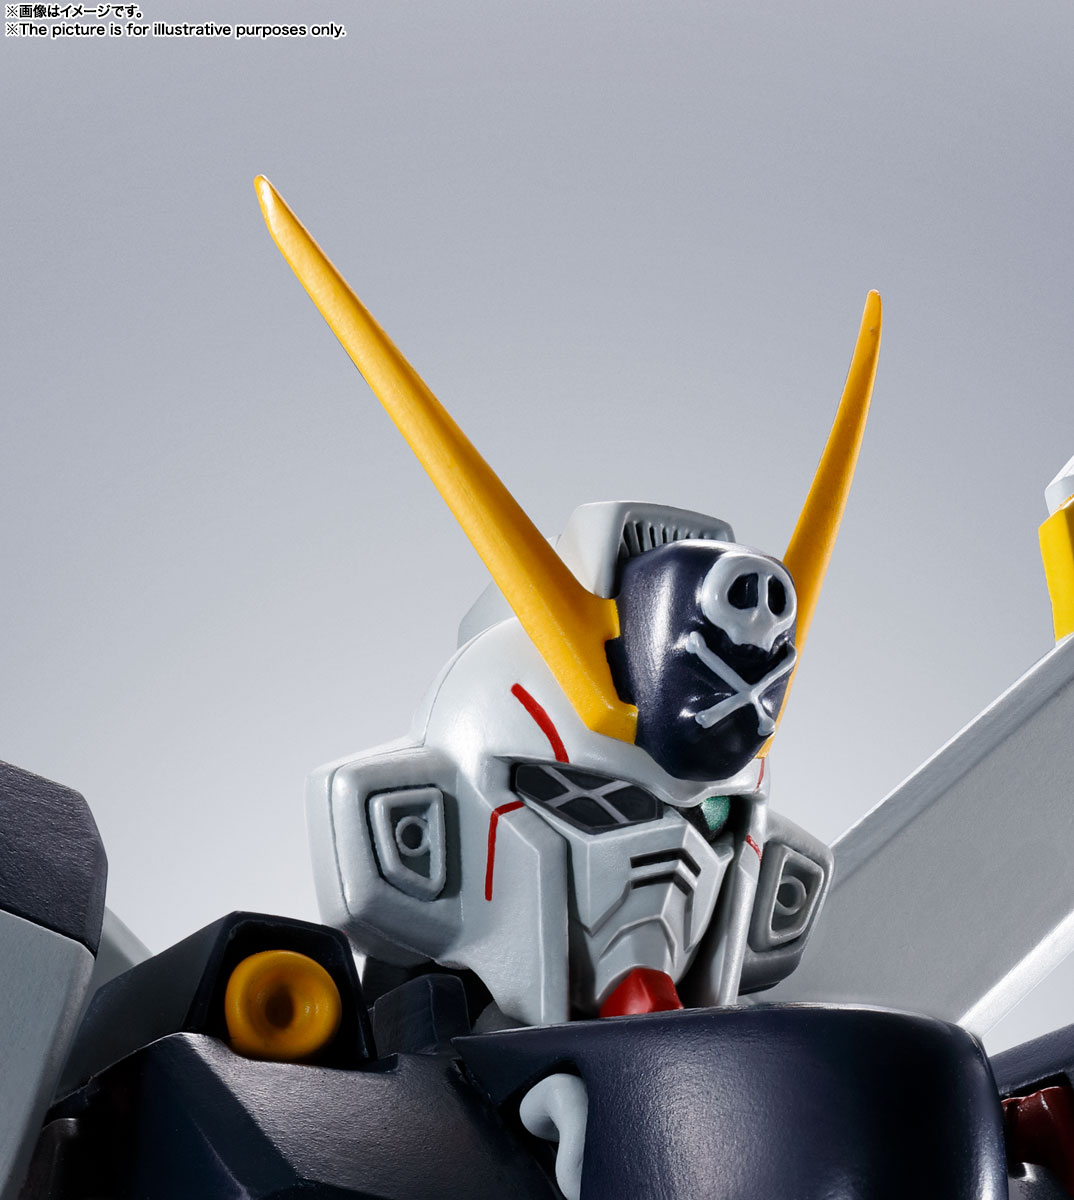 ROBOT魂〈SIDE MS〉『ガンダムX1/X1改 EVOLUTION-SPEC』クロスボーン・ガンダム 可動フィギュア-011